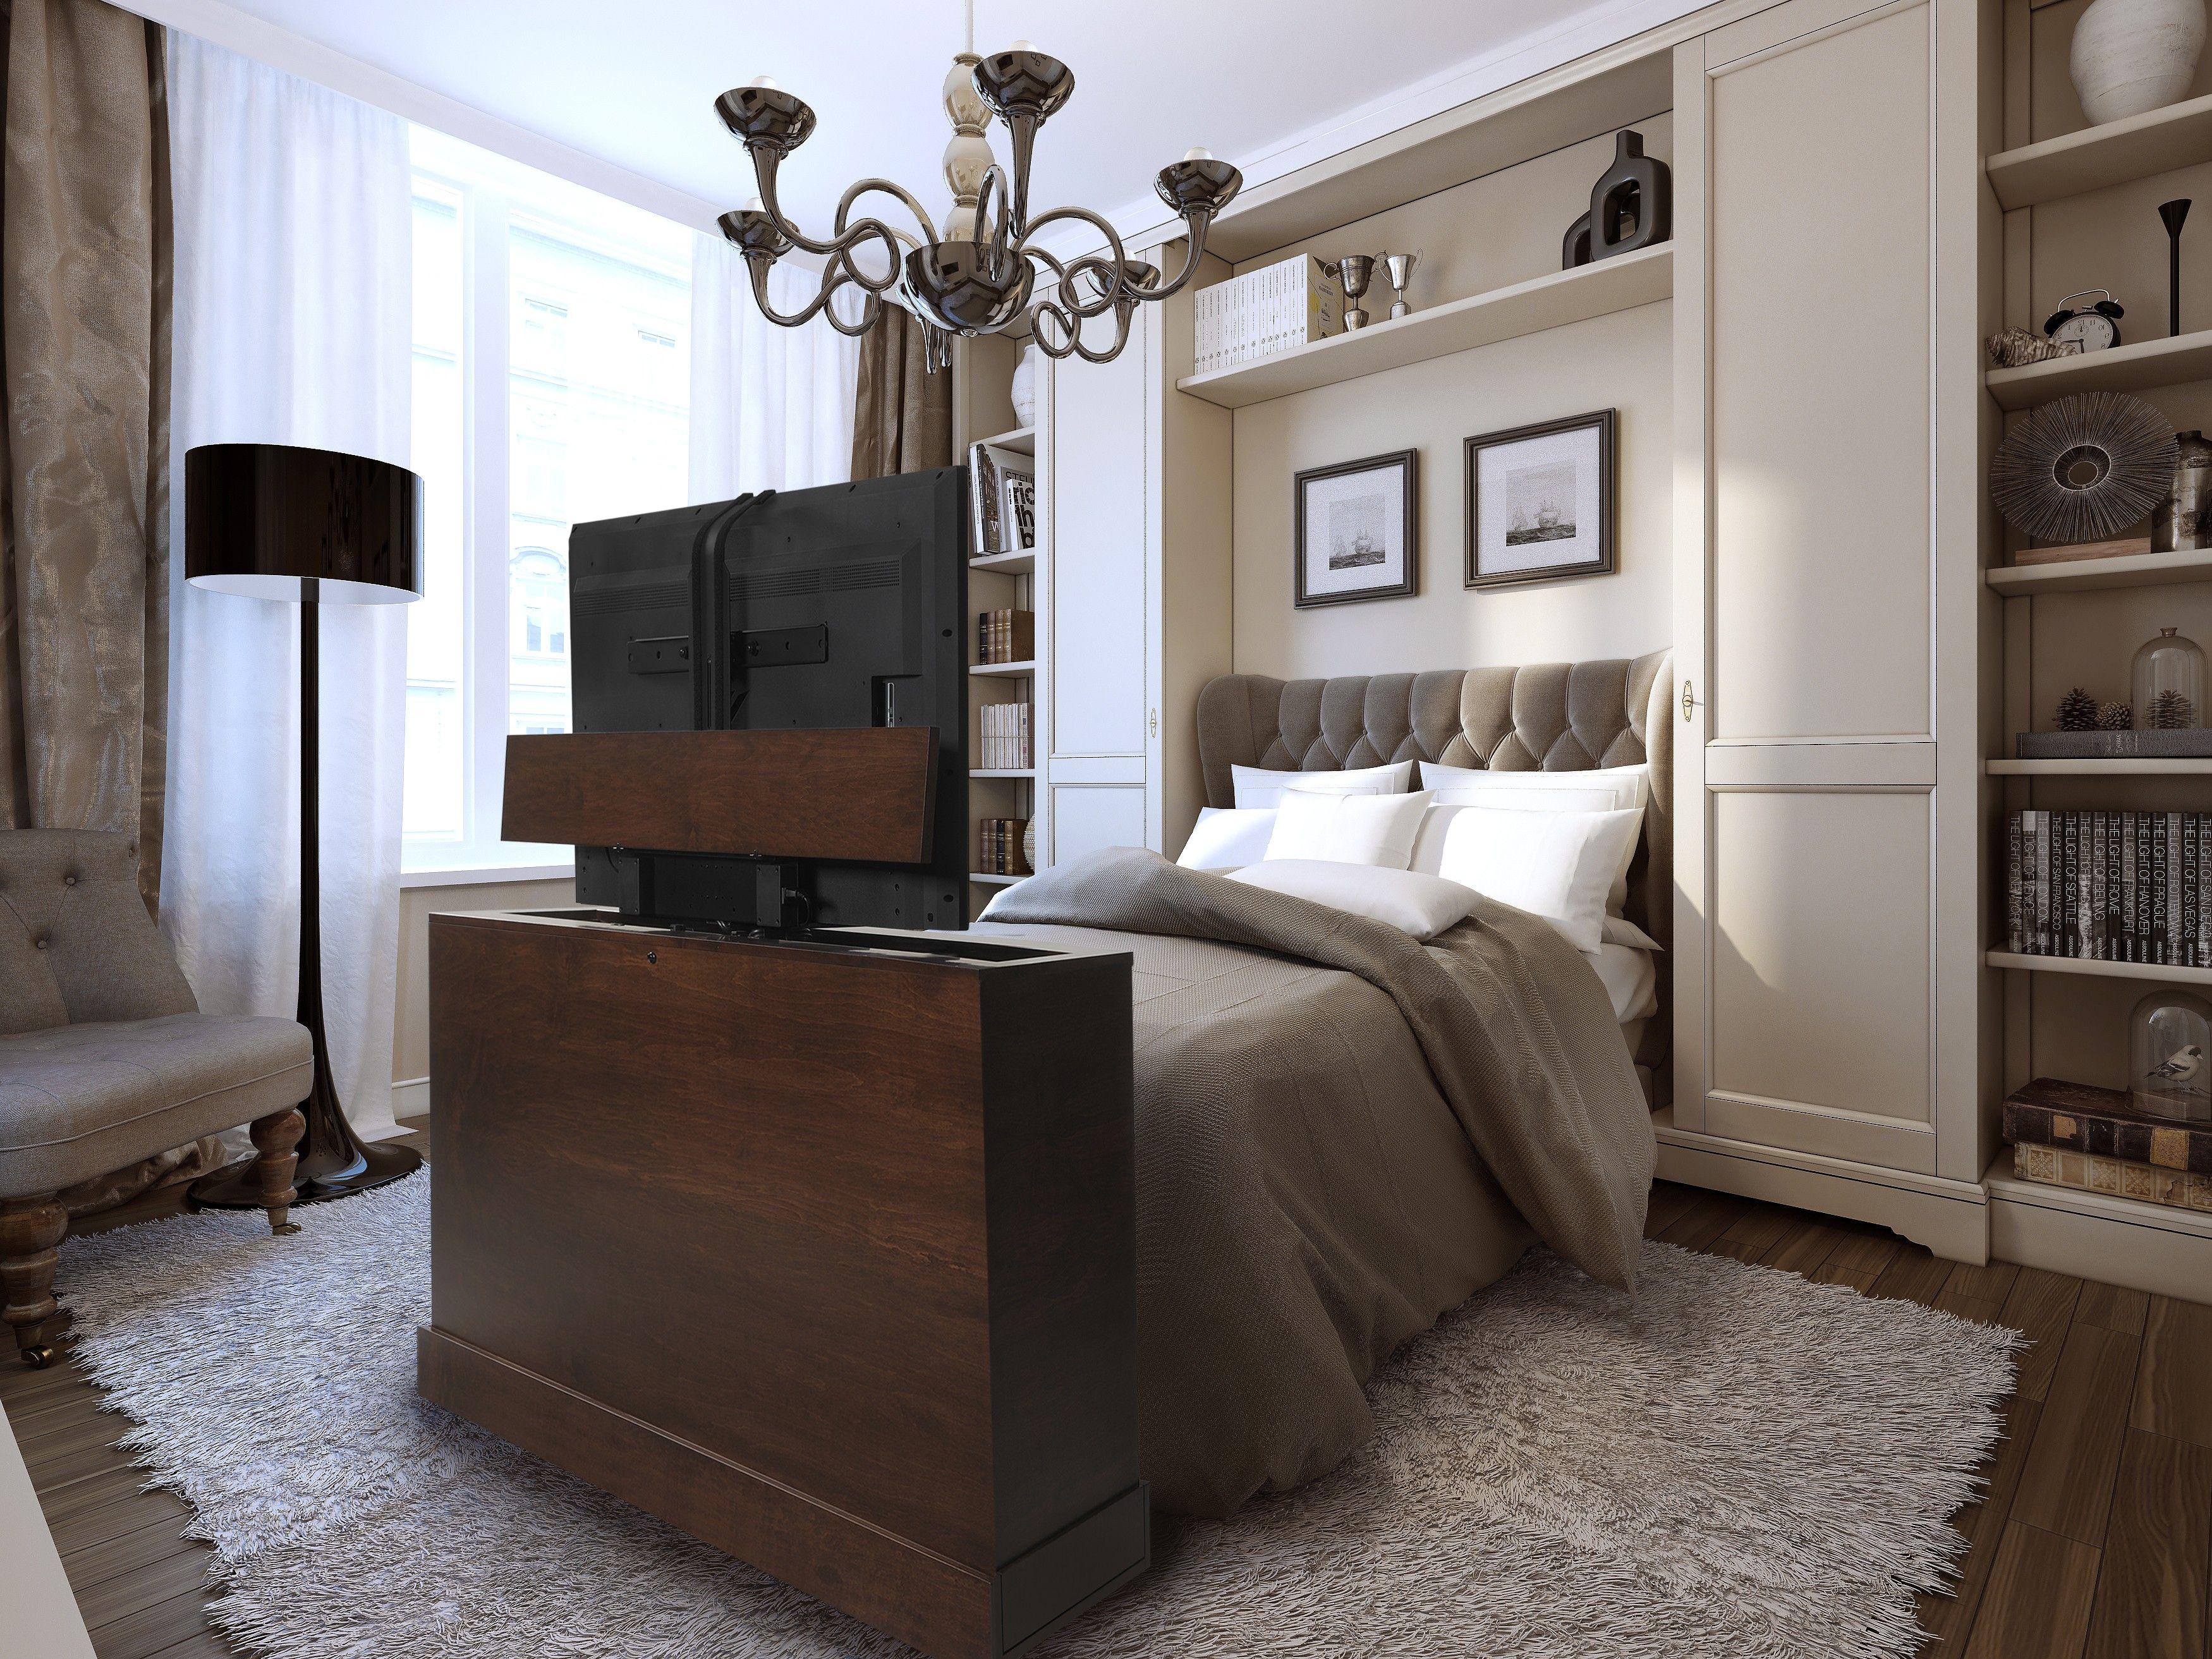 Tele Au Pied Du Lit azura 360 degree swivel in sonoma finish tv lift cabinet